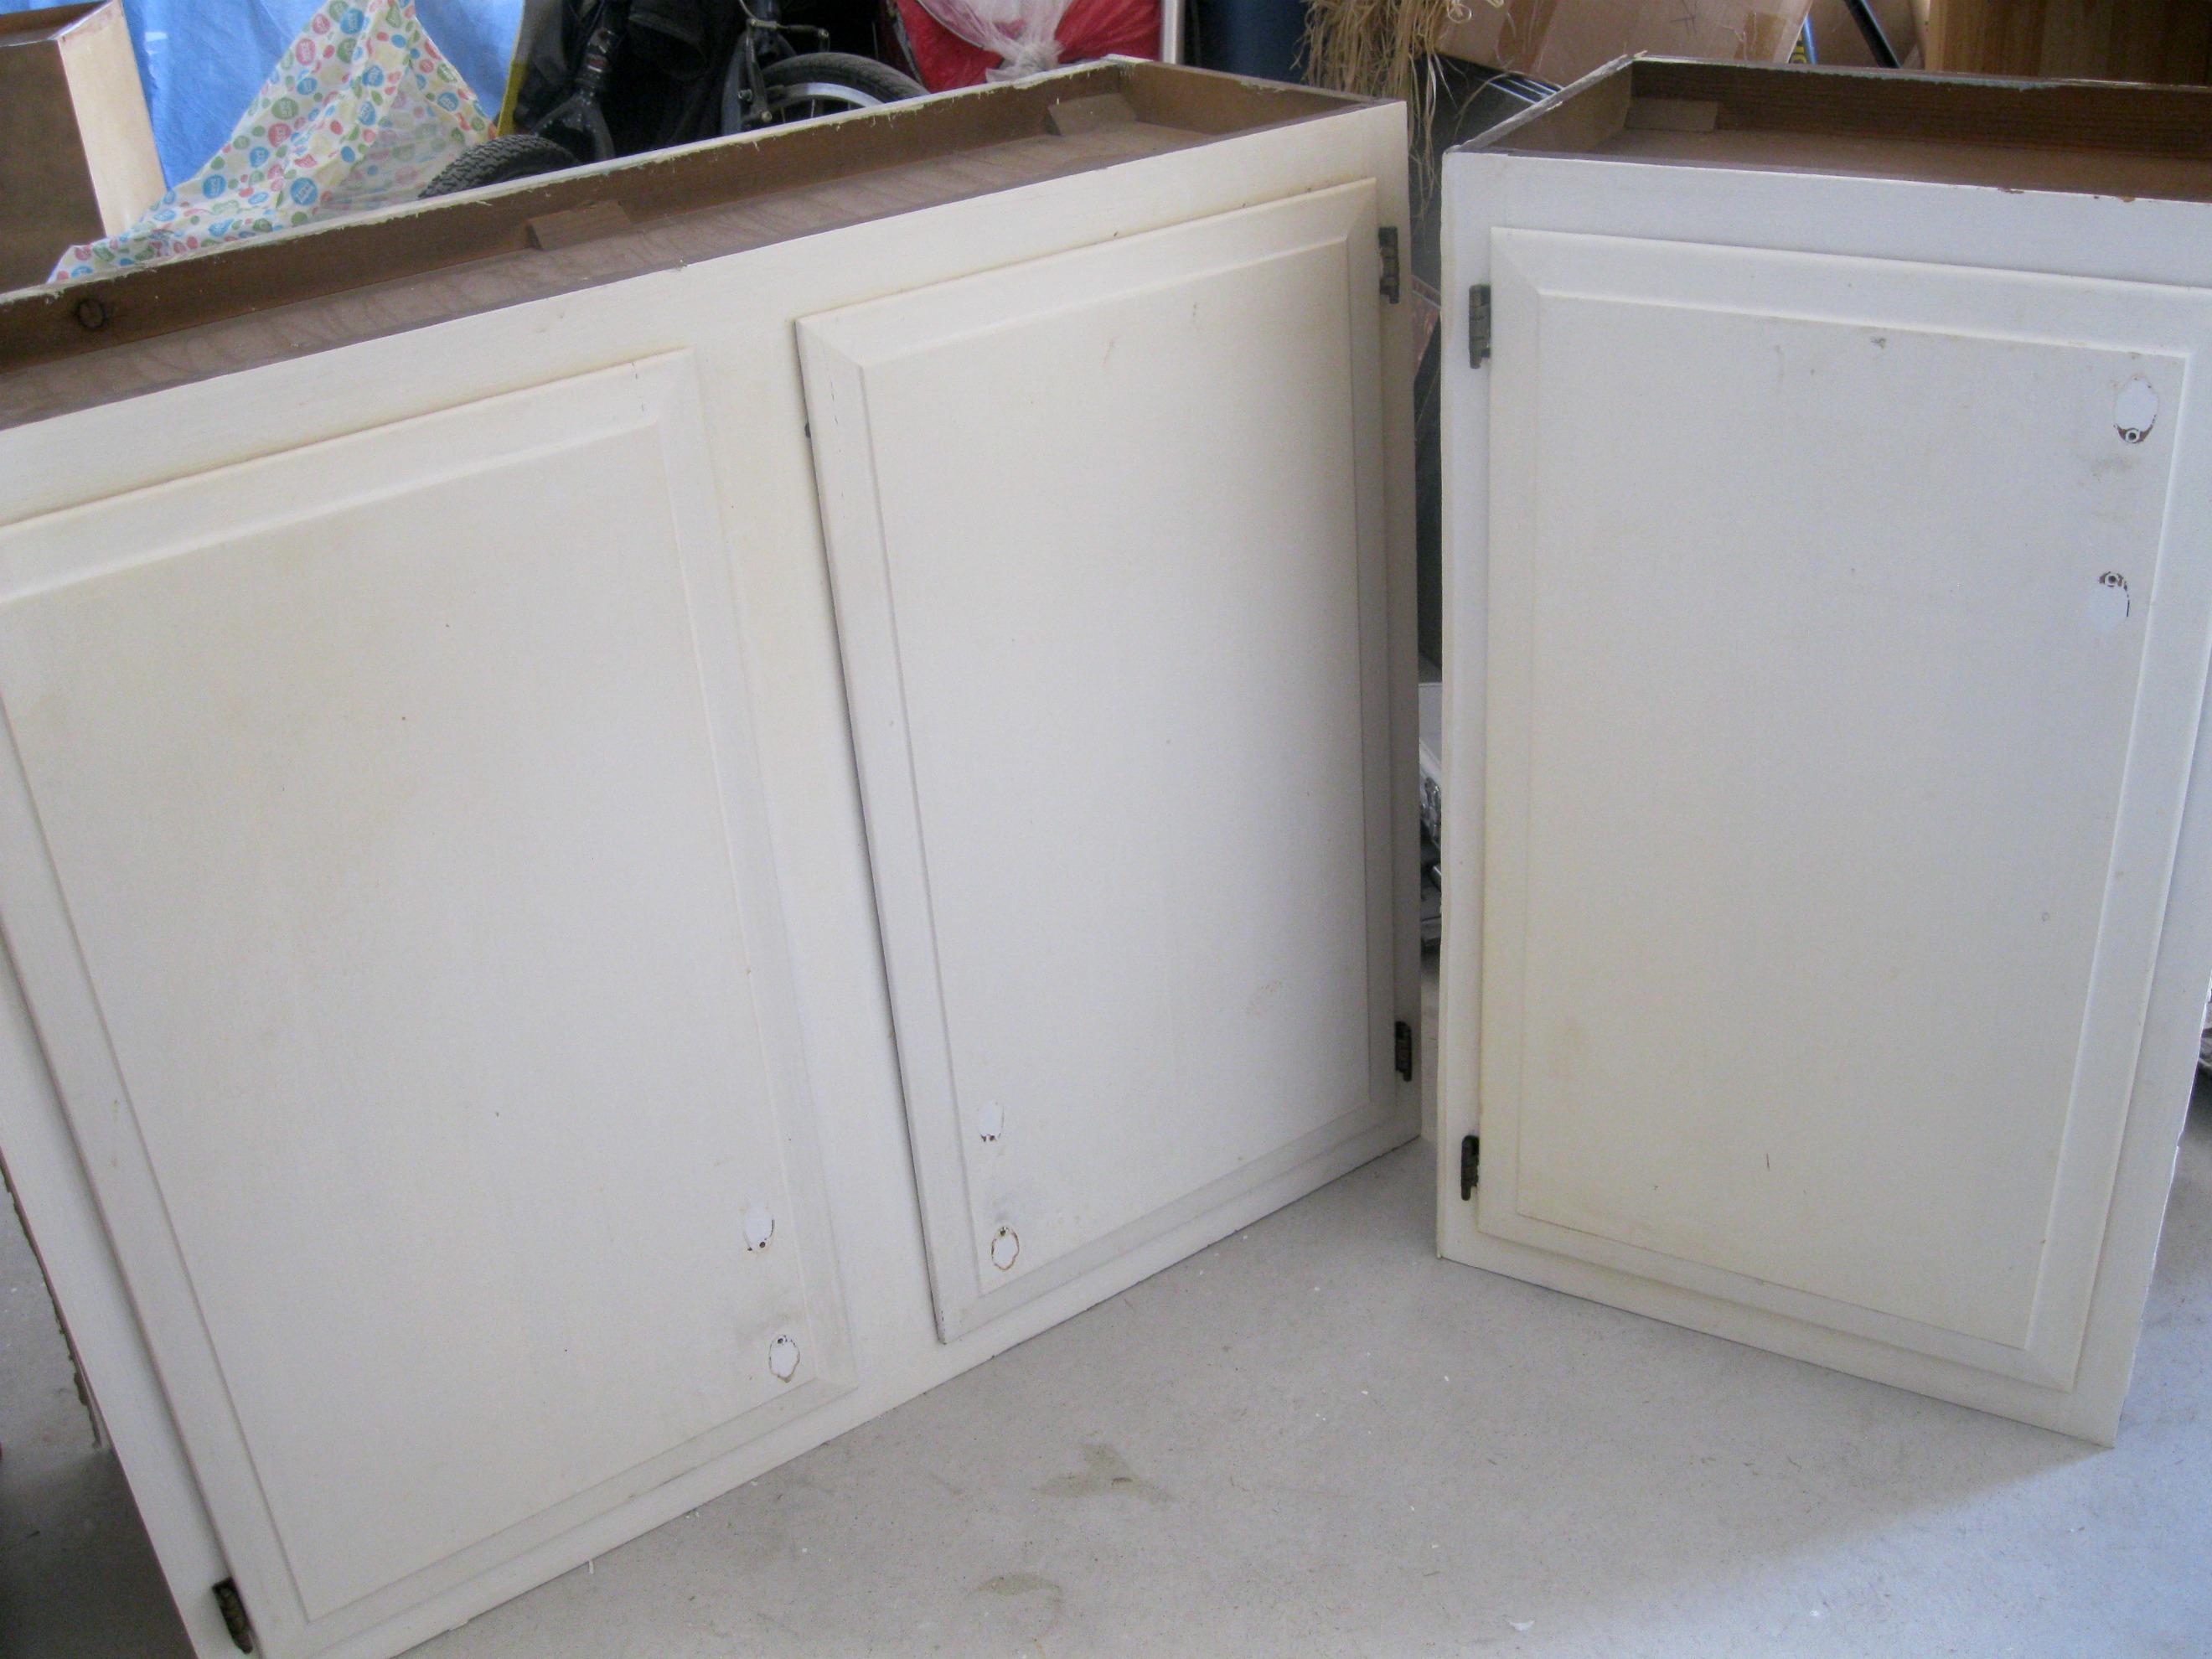 peeling - Laundry Room Wall Cabinets